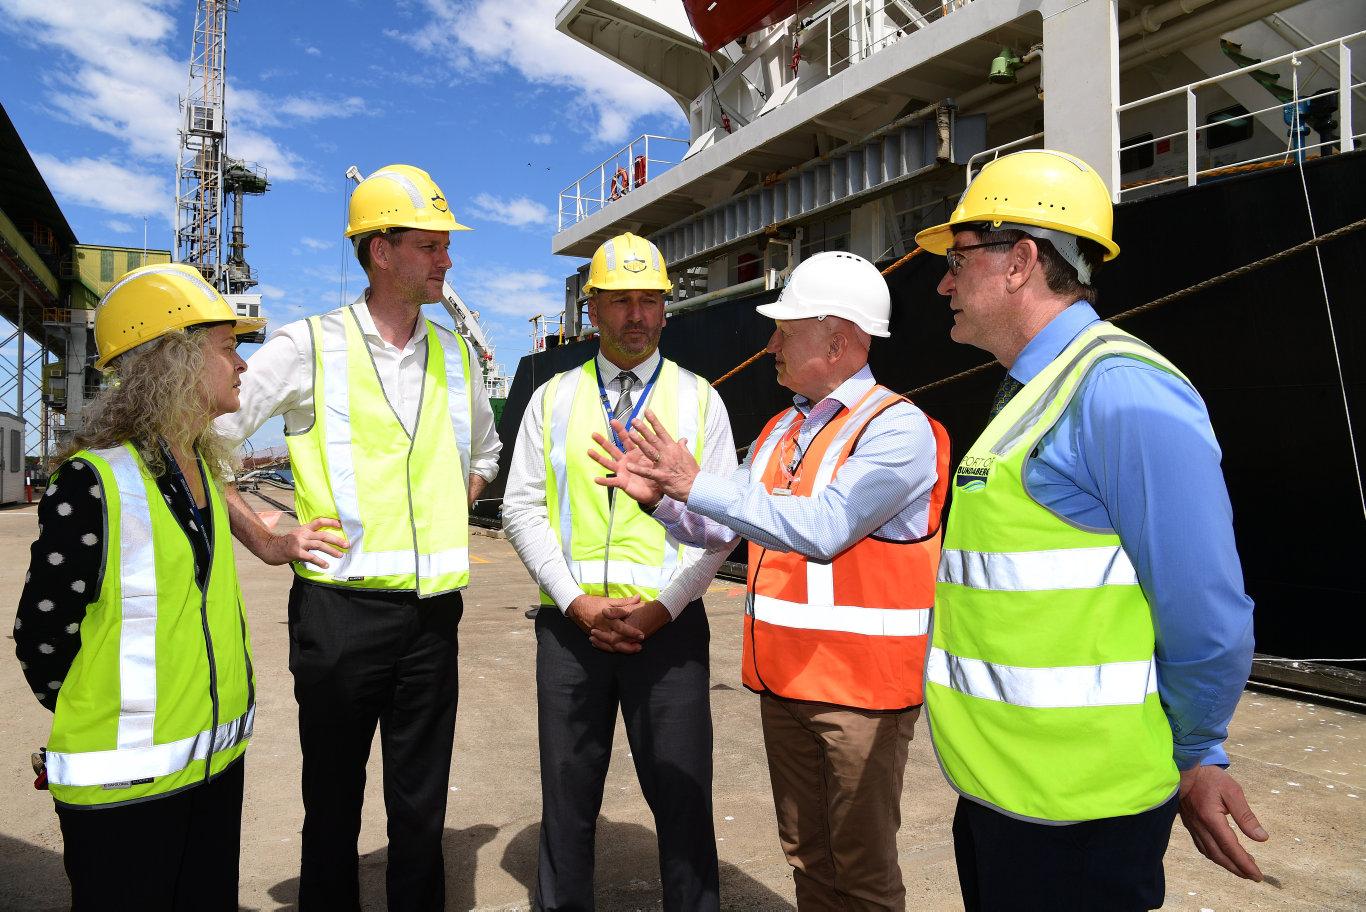 Peta Jamieson, Minister for Transport and Main Roads Mark Bailey, Craig Walker, John Warda and Jason Pascoe at the Bundaberg sugar terminal.